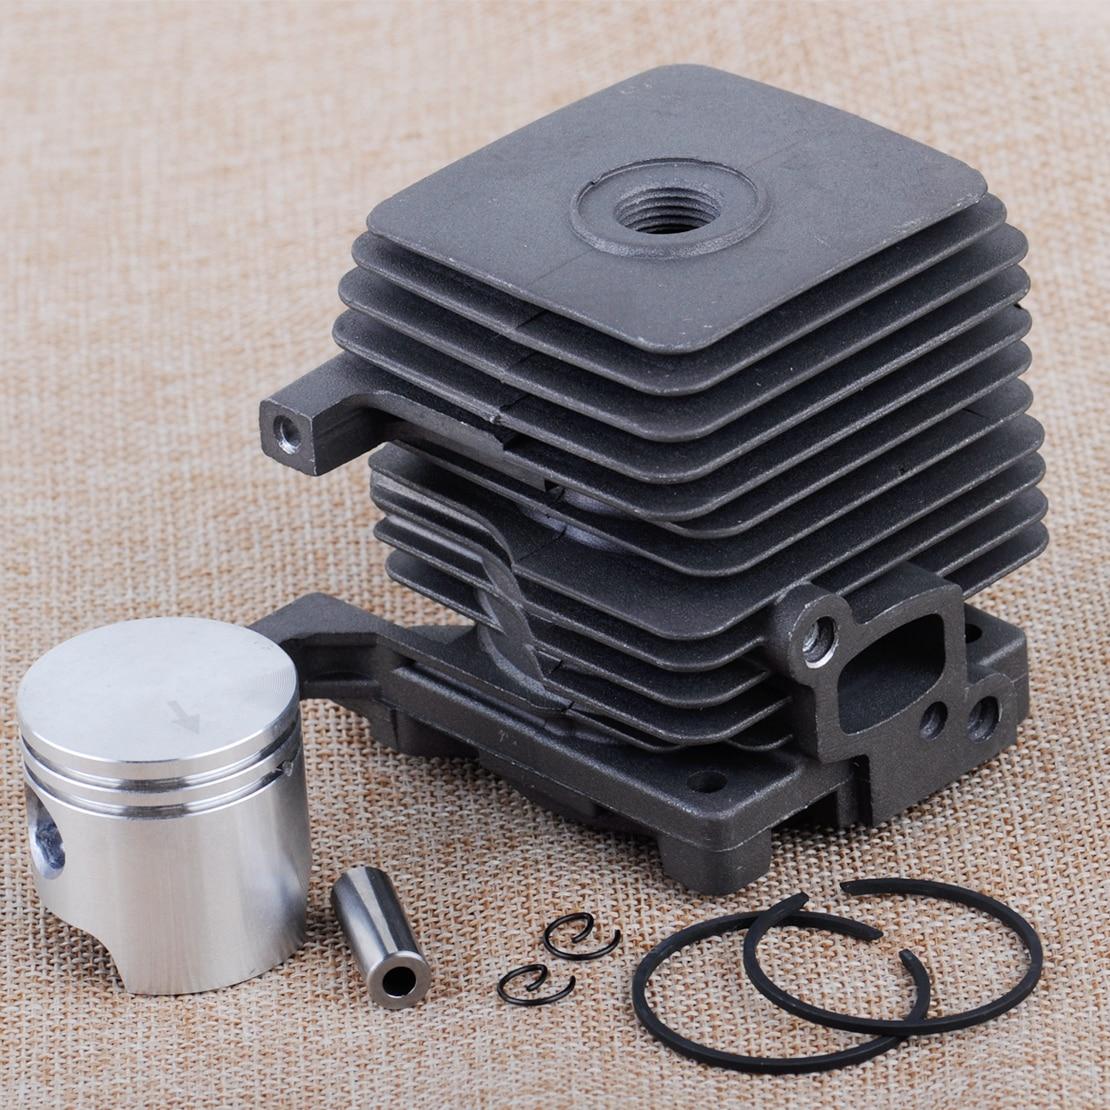 LETAOSK Cylinder Piston Kit Fit for STIHL FS55 FS45 BR45 KM55 HL45 HS45 HS55 4140 020 1202 50mm cylinder piston kit for stihl ts420 ts410 cut off saws oem 4238 020 1202